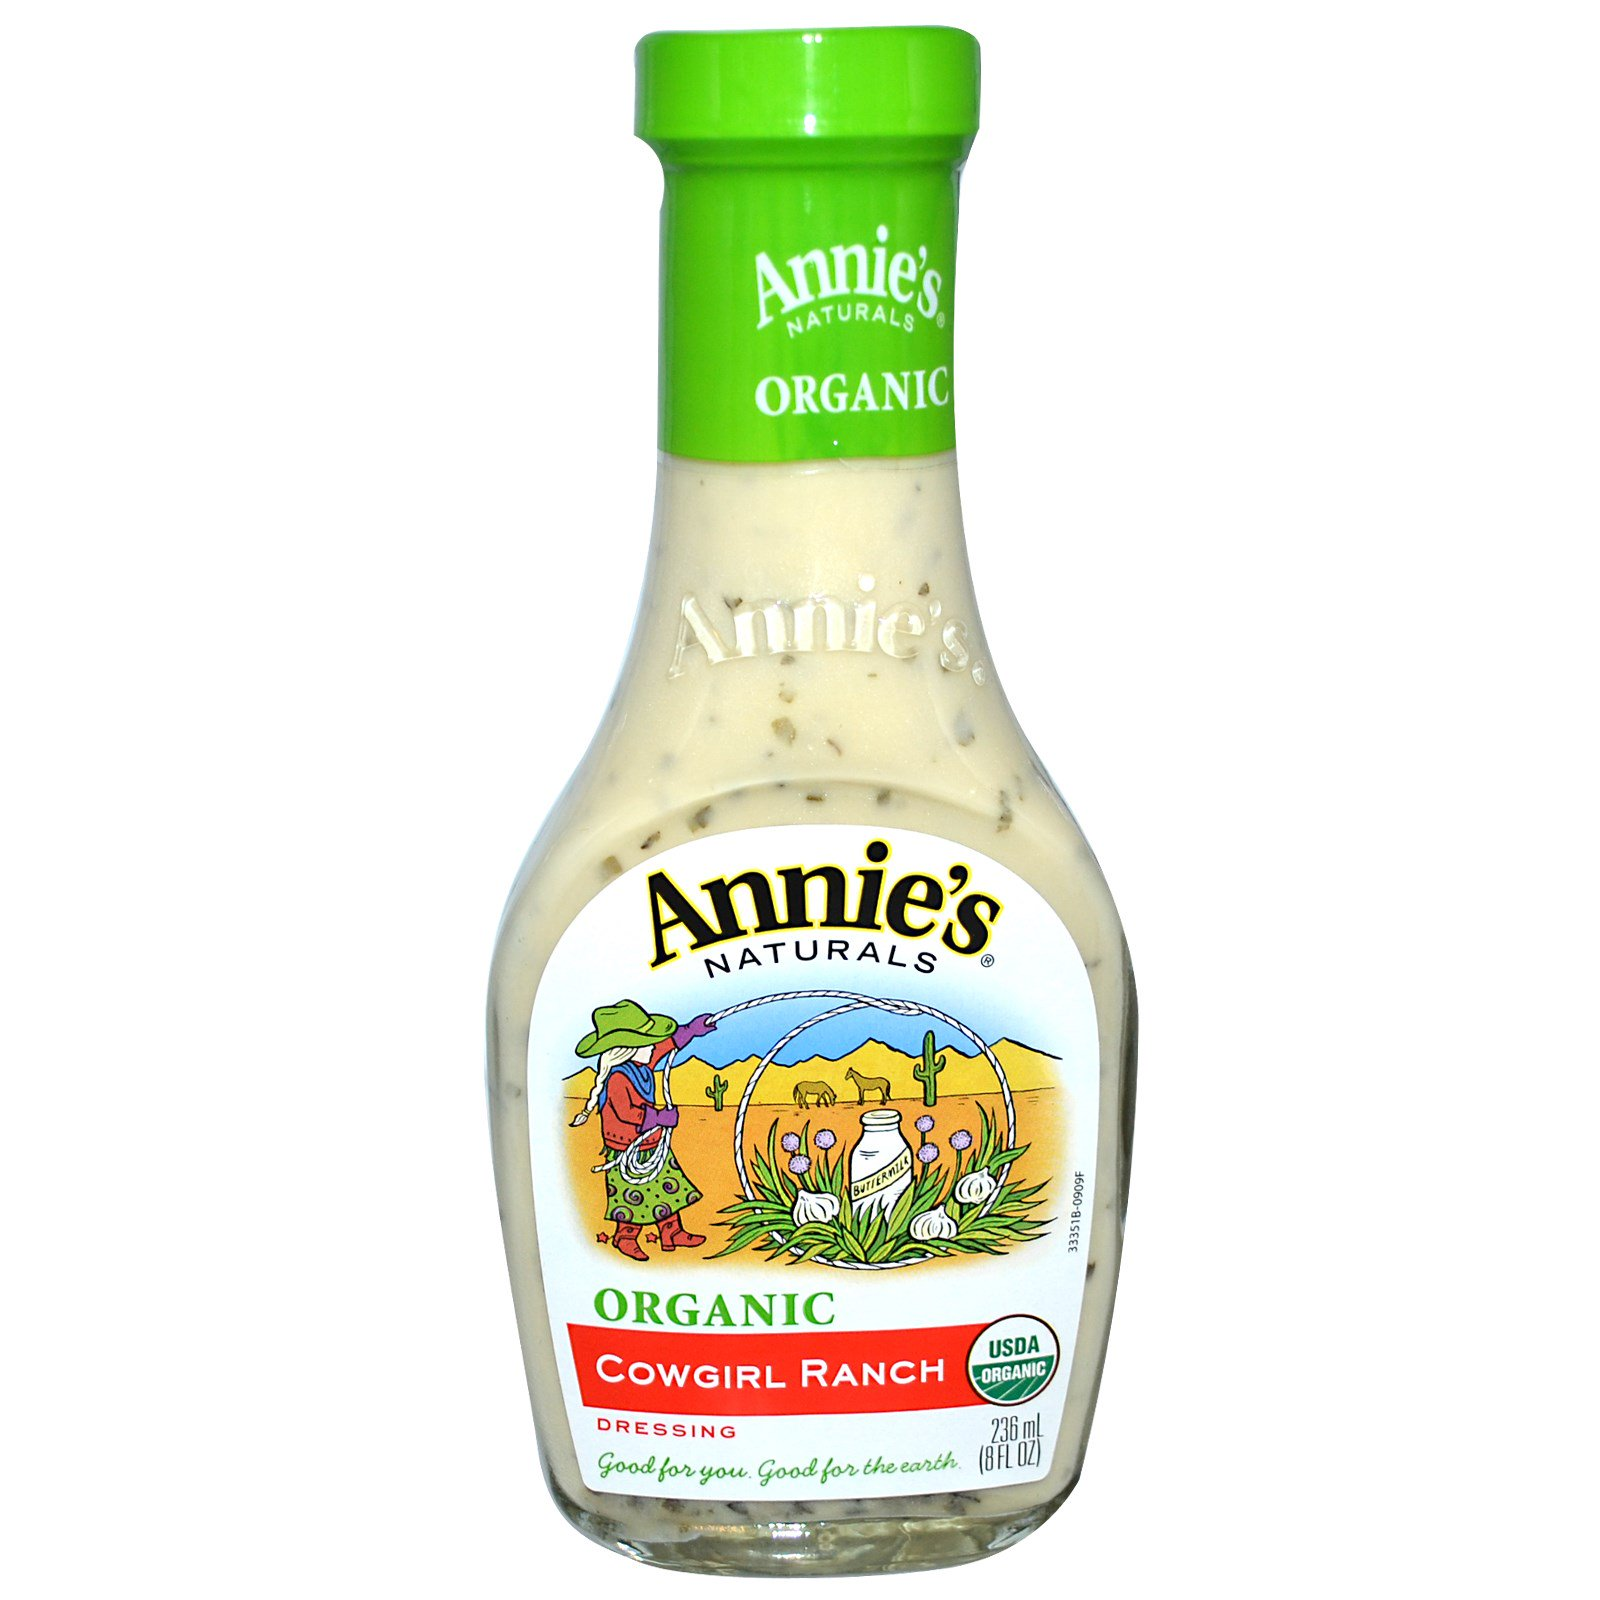 Annie's Naturals, Органический, фермерский соус «Девушка-ковбой», 8 жидк. унц. (236 мл)